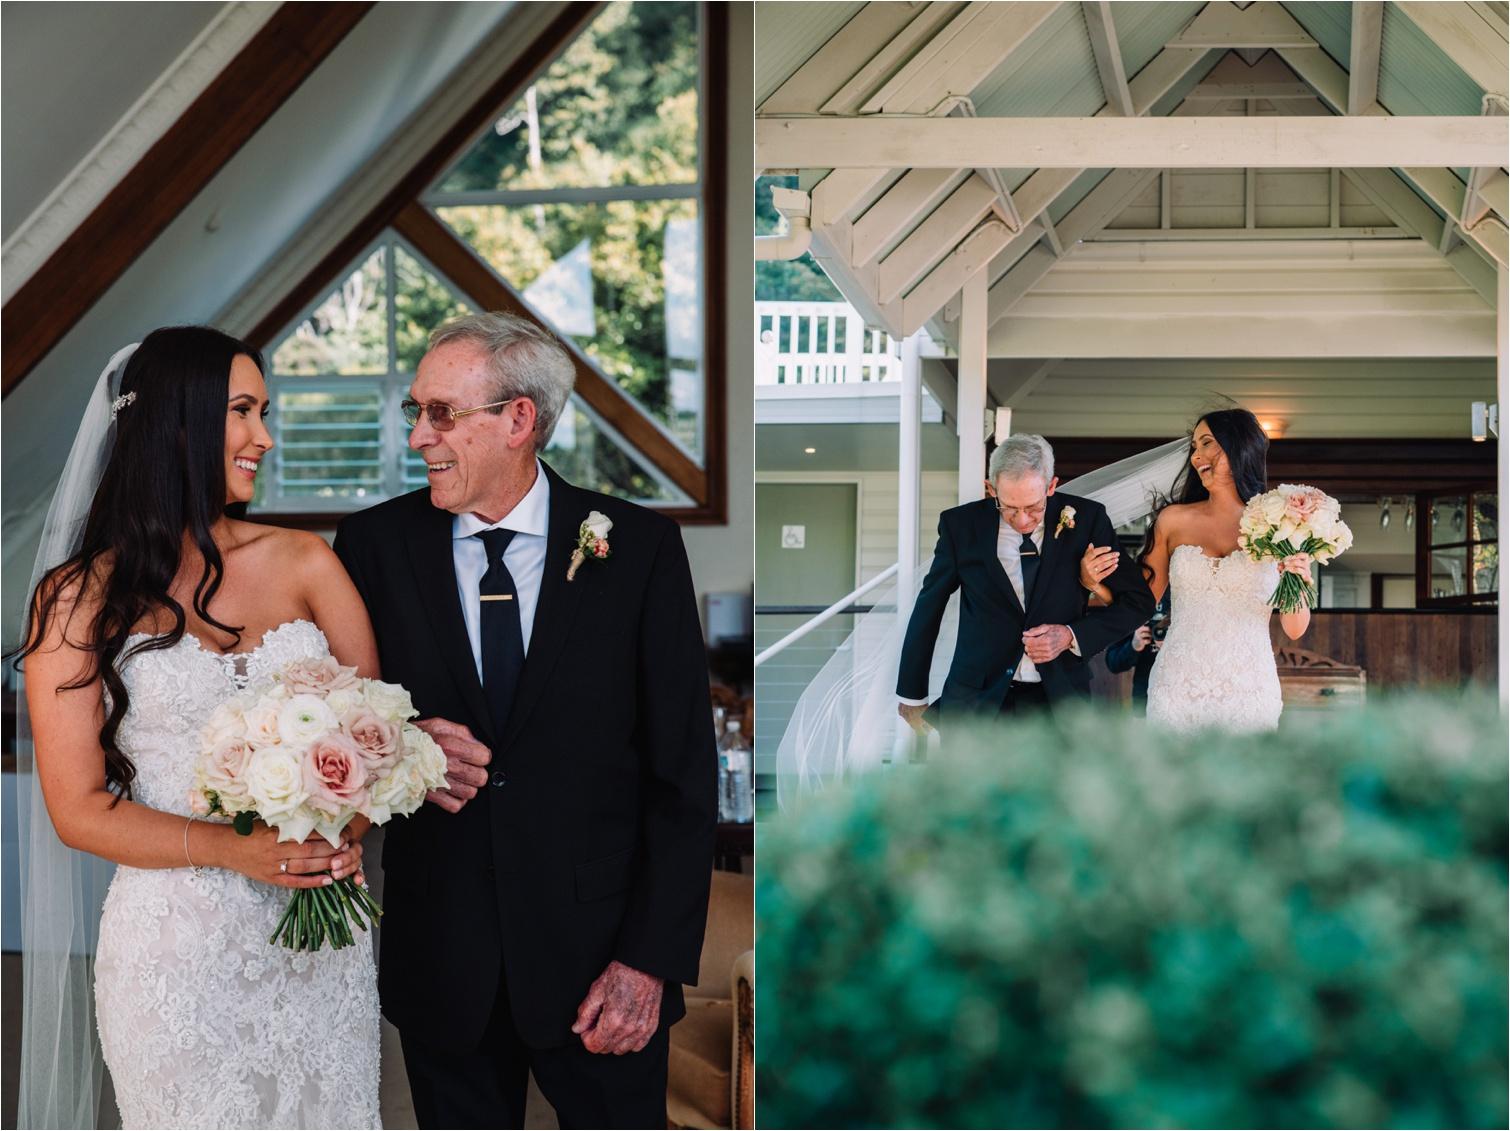 Maleny Manor Wedding Photography - Gold Coast Wedding Photographer_0022.jpg